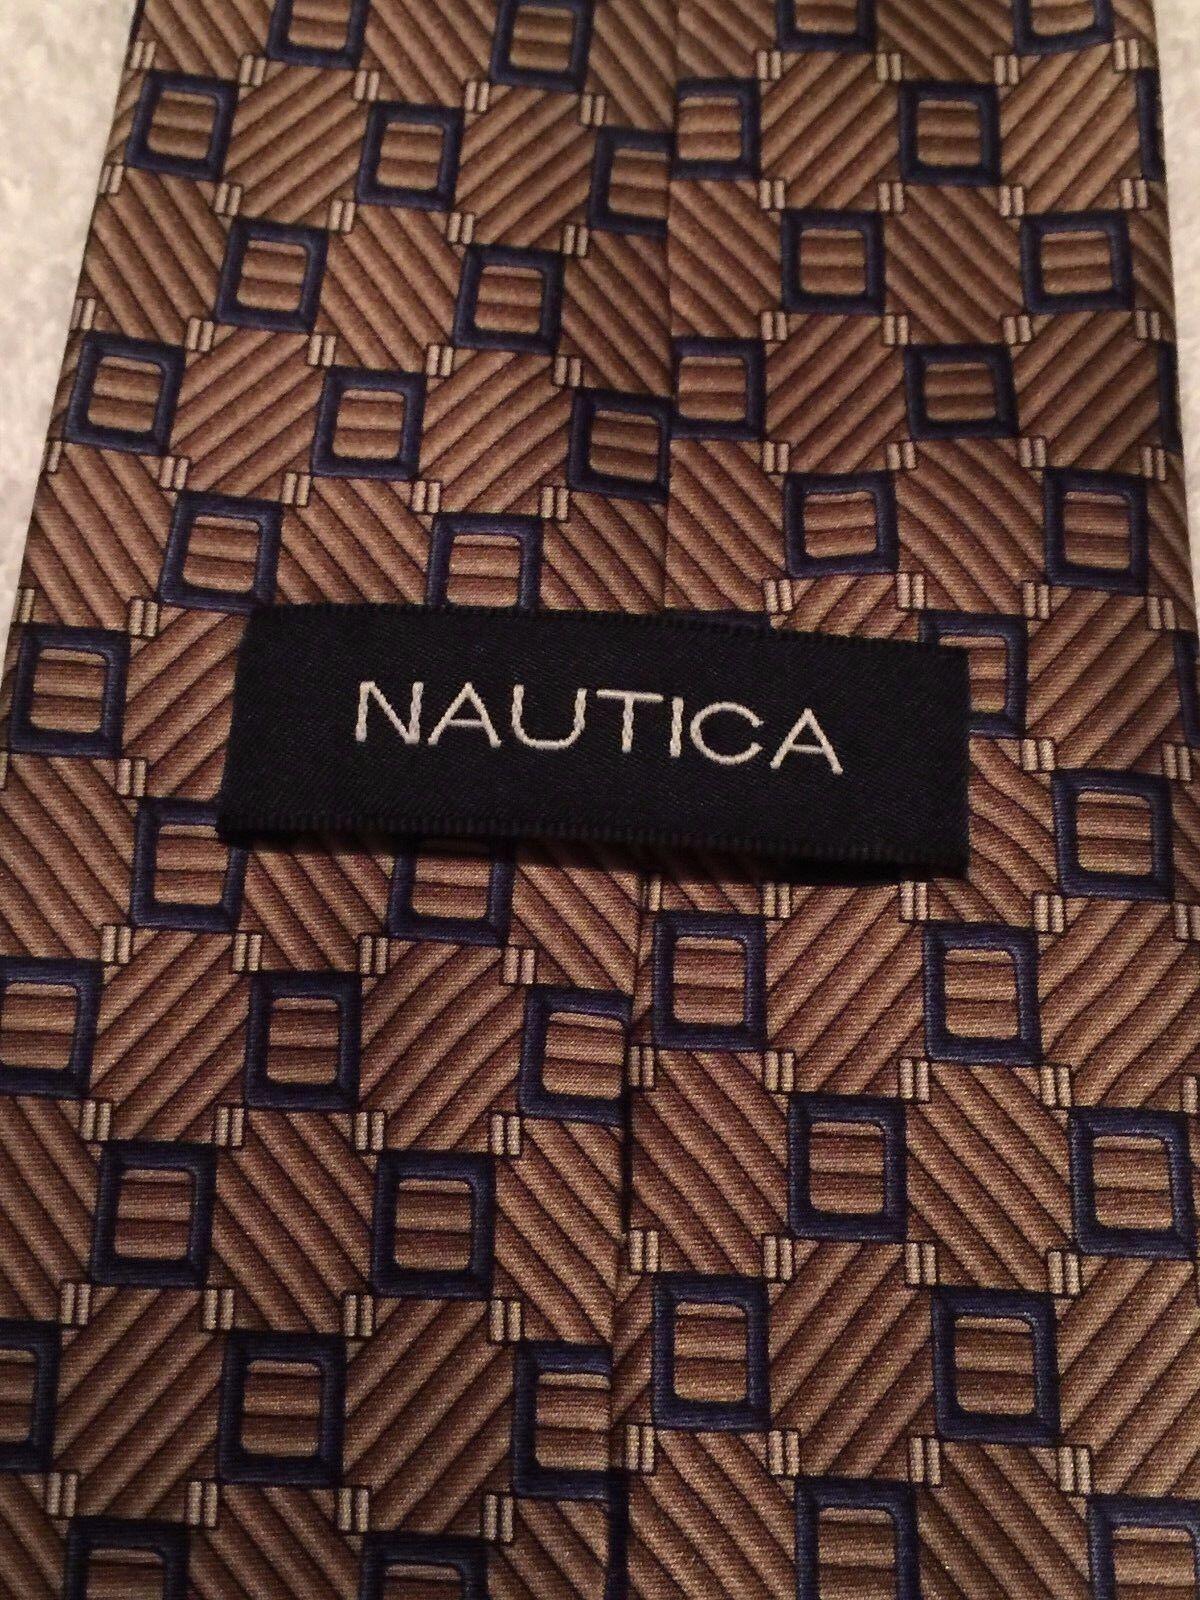 NAUTICA  MENS TIE BEIGE WITH NAVY BLUE SQUARES  4… - image 5